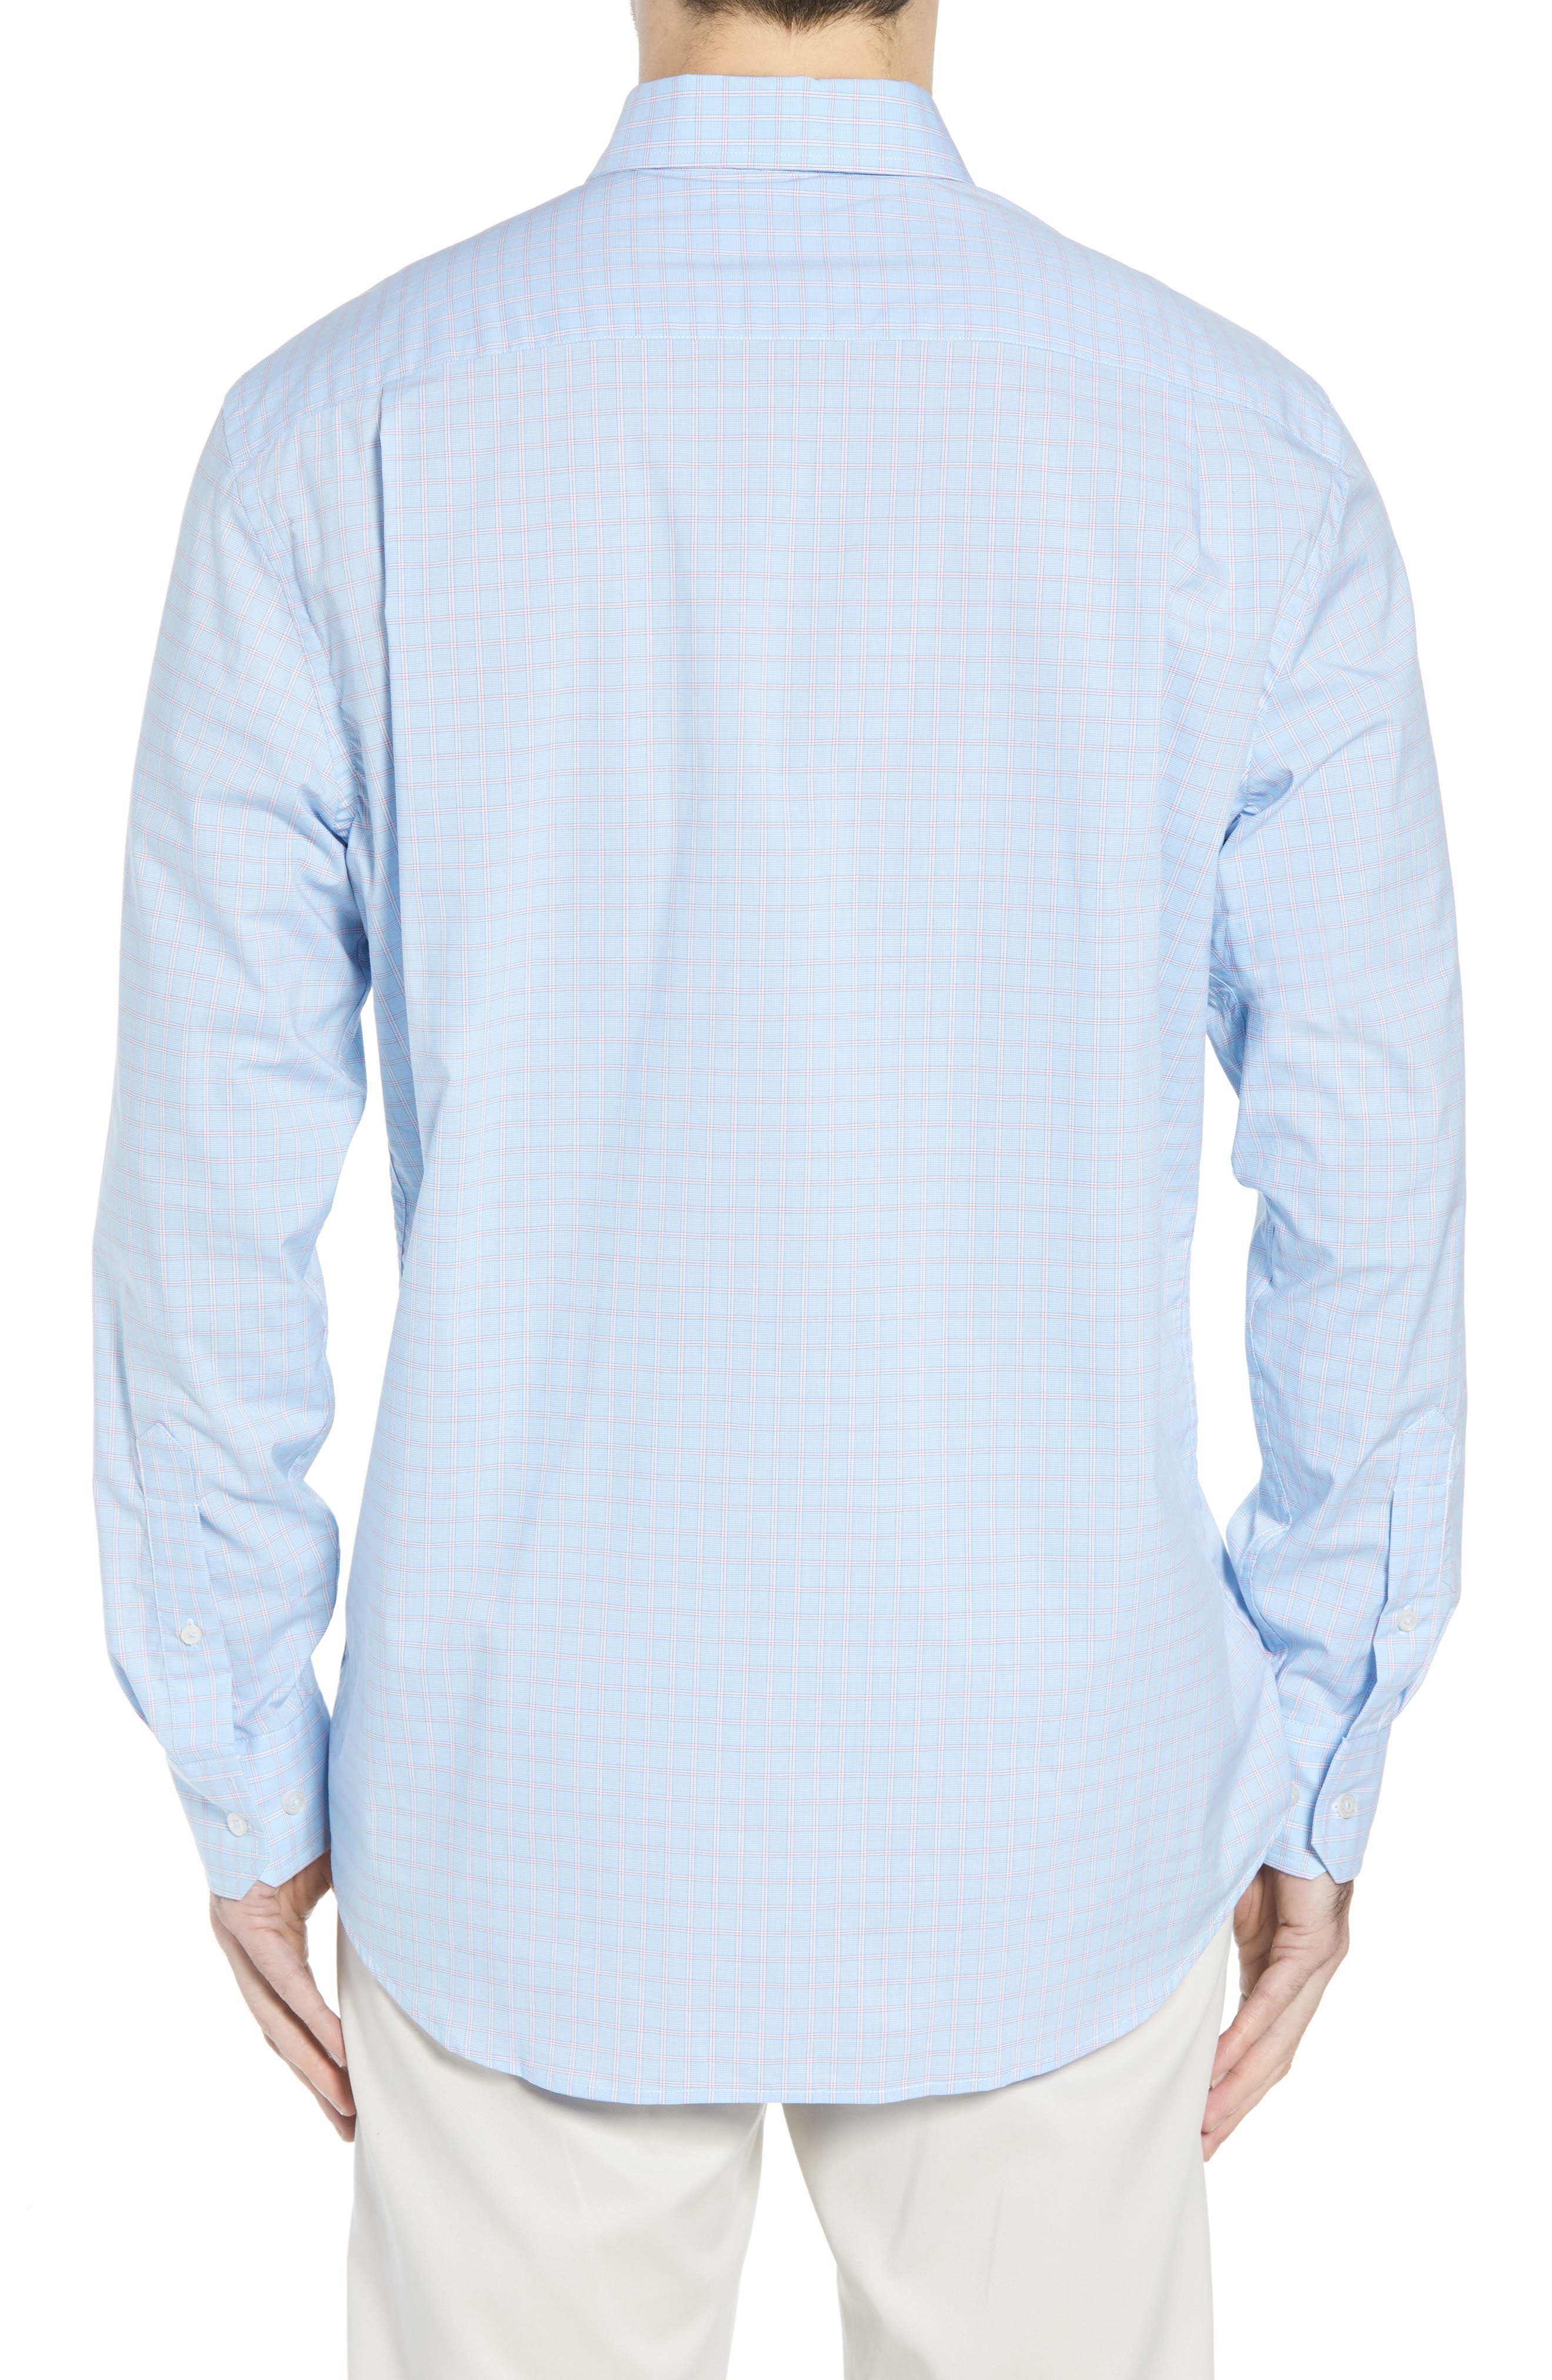 Buck Island Regular Fit Stretch Check Sport Shirt,                             Alternate thumbnail 3, color,                             Blue Stream